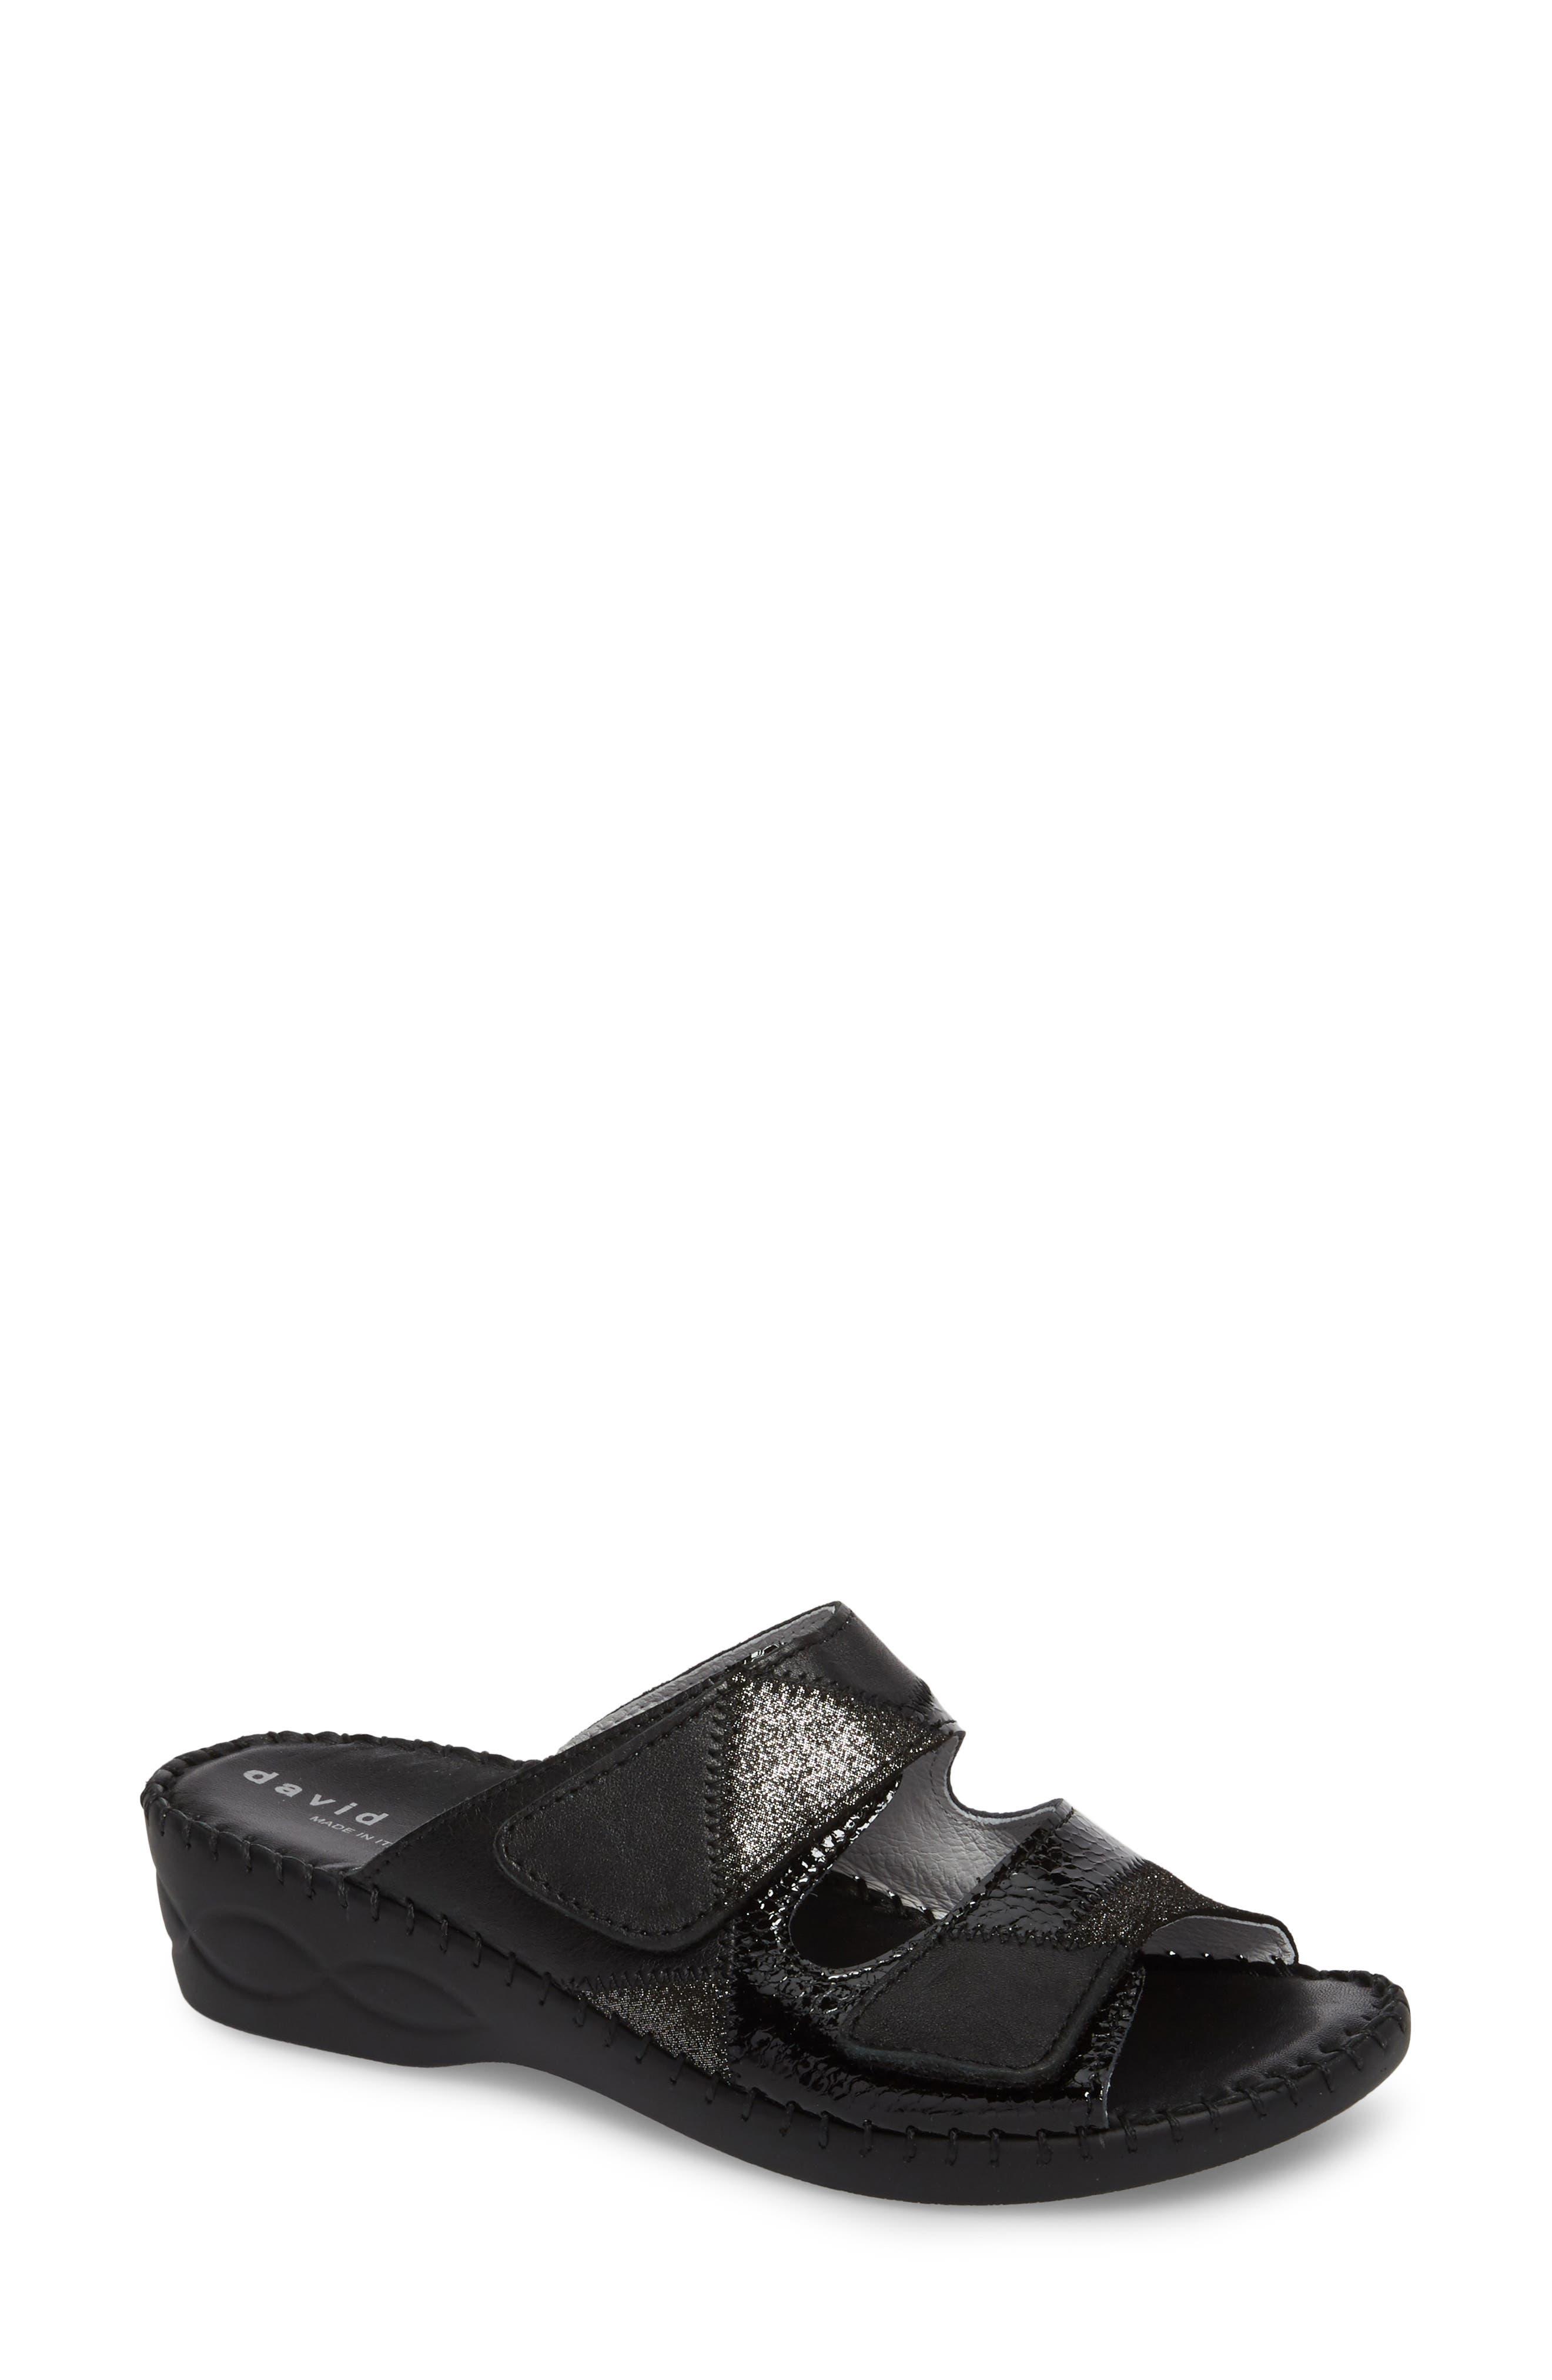 Flex Slide Sandal,                             Main thumbnail 1, color,                             BLACK LEATHER